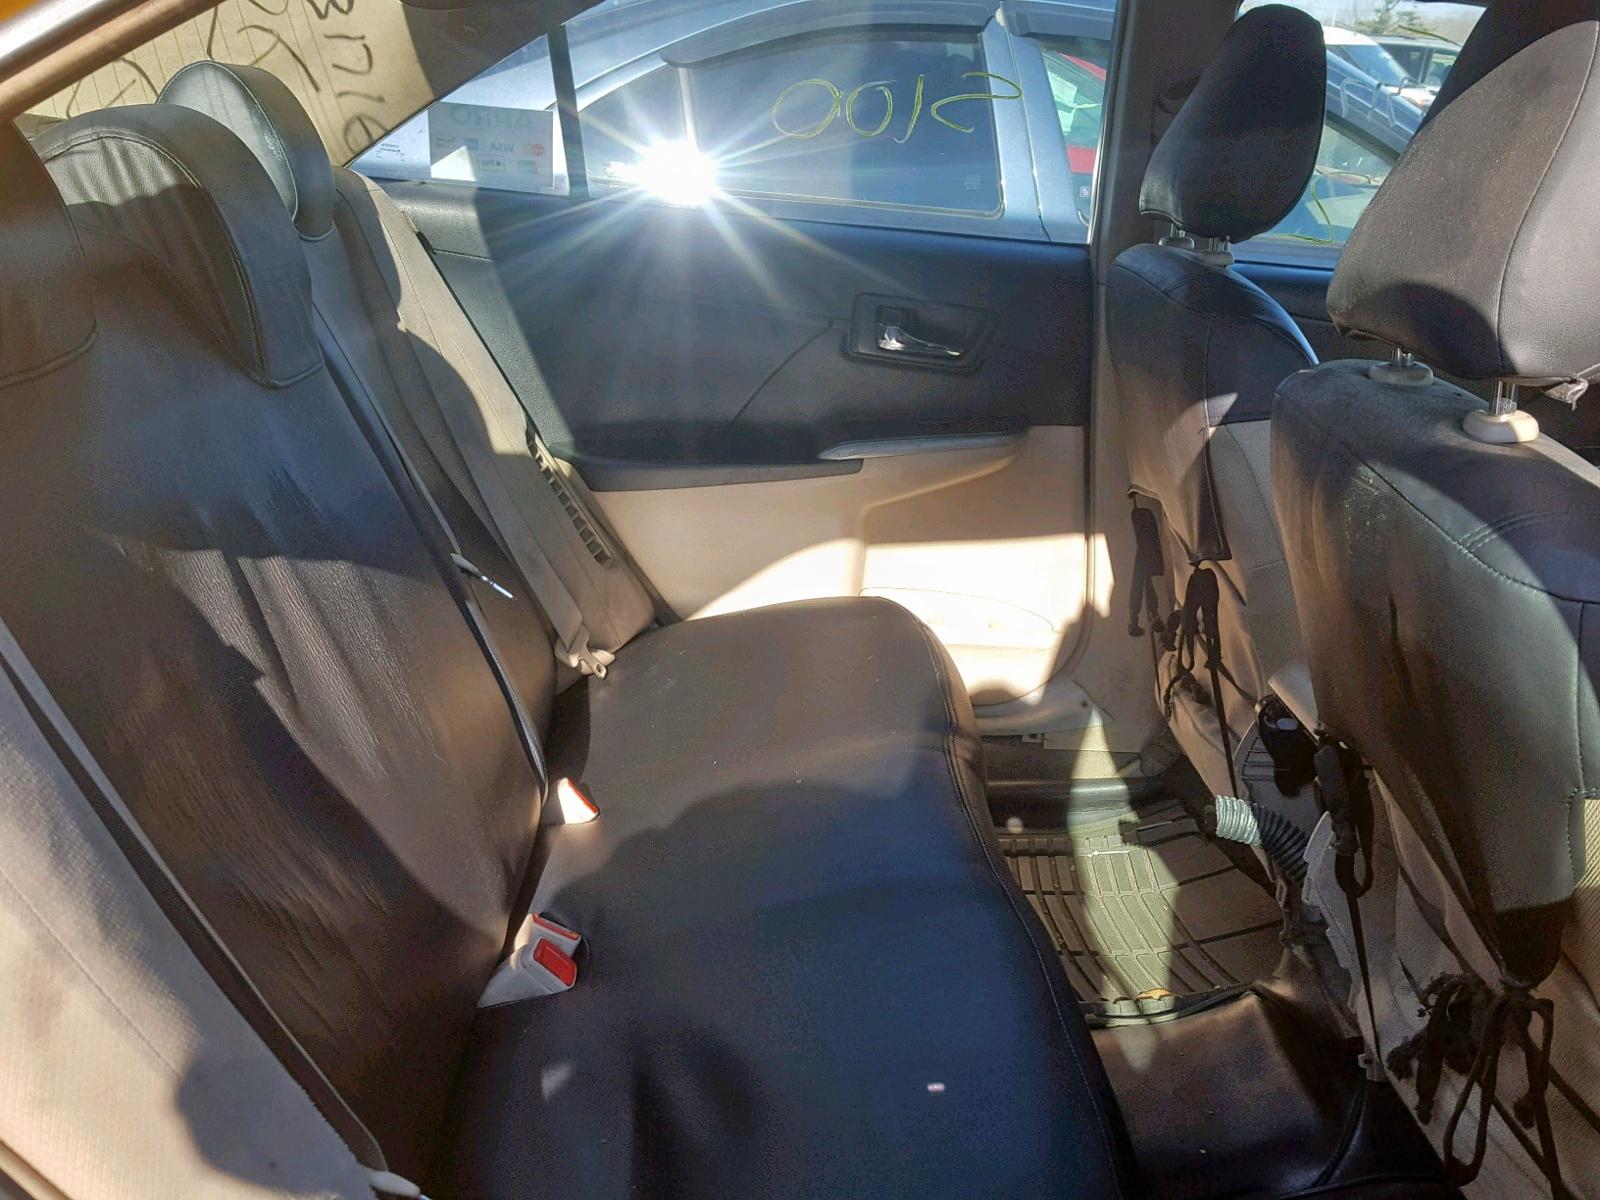 2012 Toyota Camry Hybr 2.5L detail view